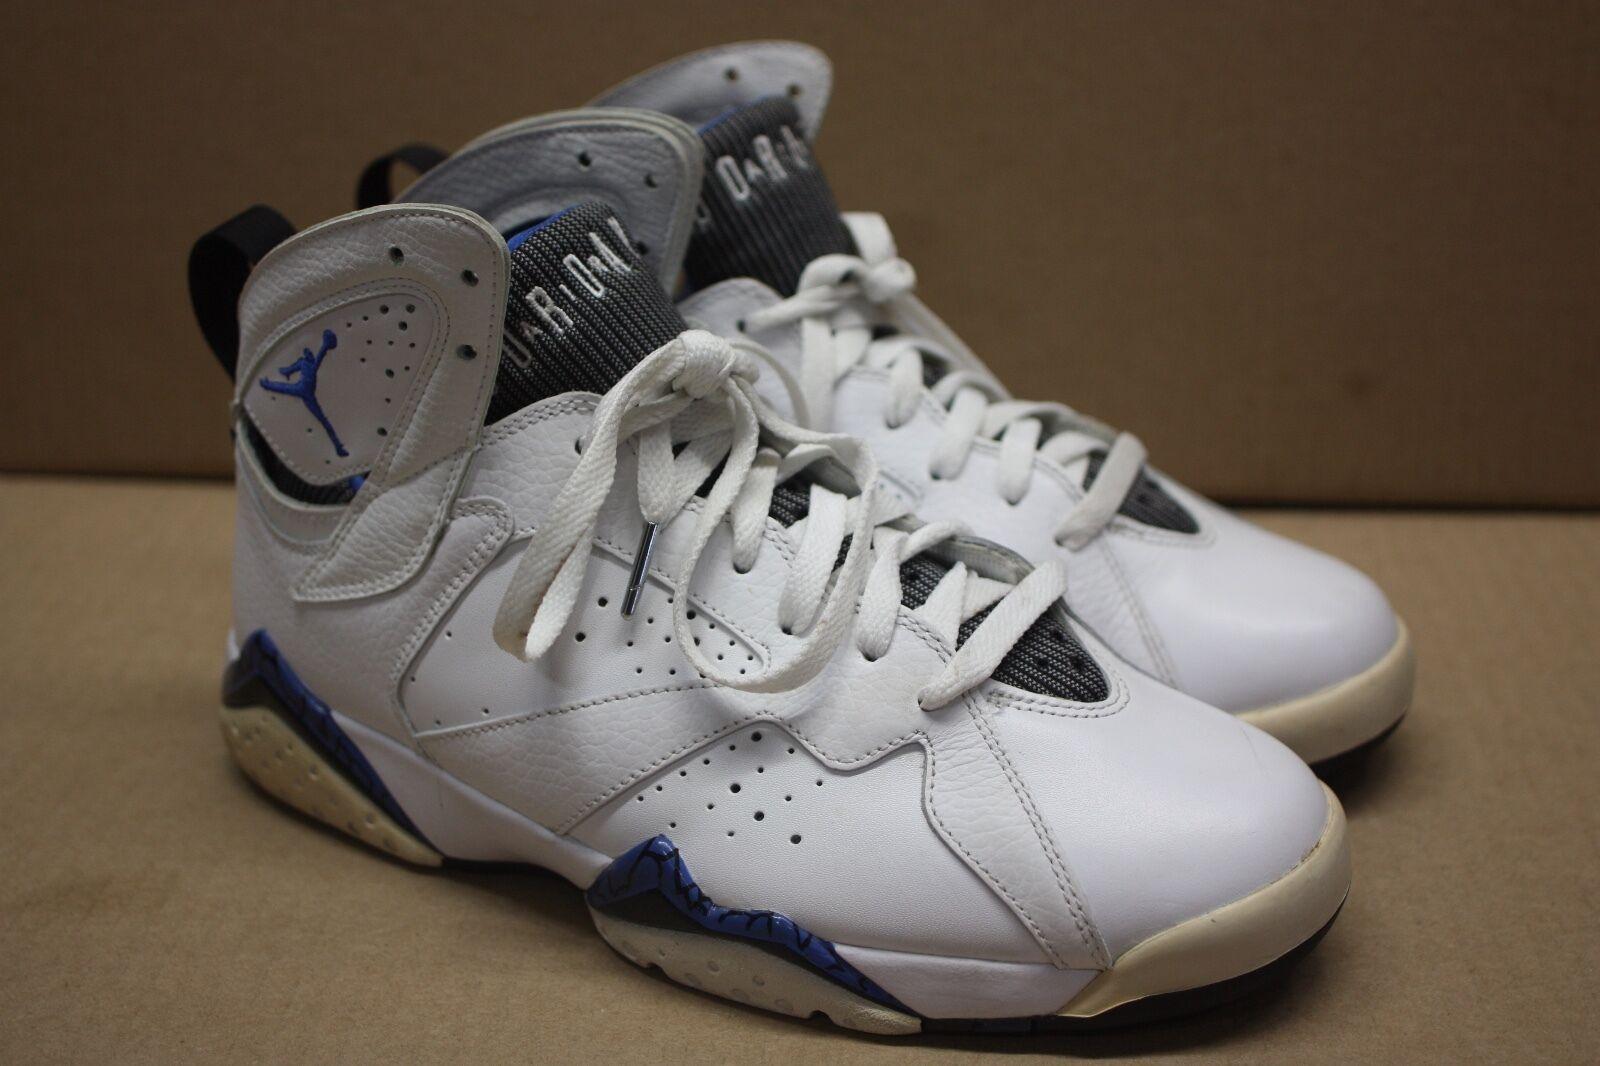 Nike air jordan vii 7 retrò orlando dmp bianco bianco bianco / blu / blk 304775 161 sz 8us / 7uk / 4 fc040d